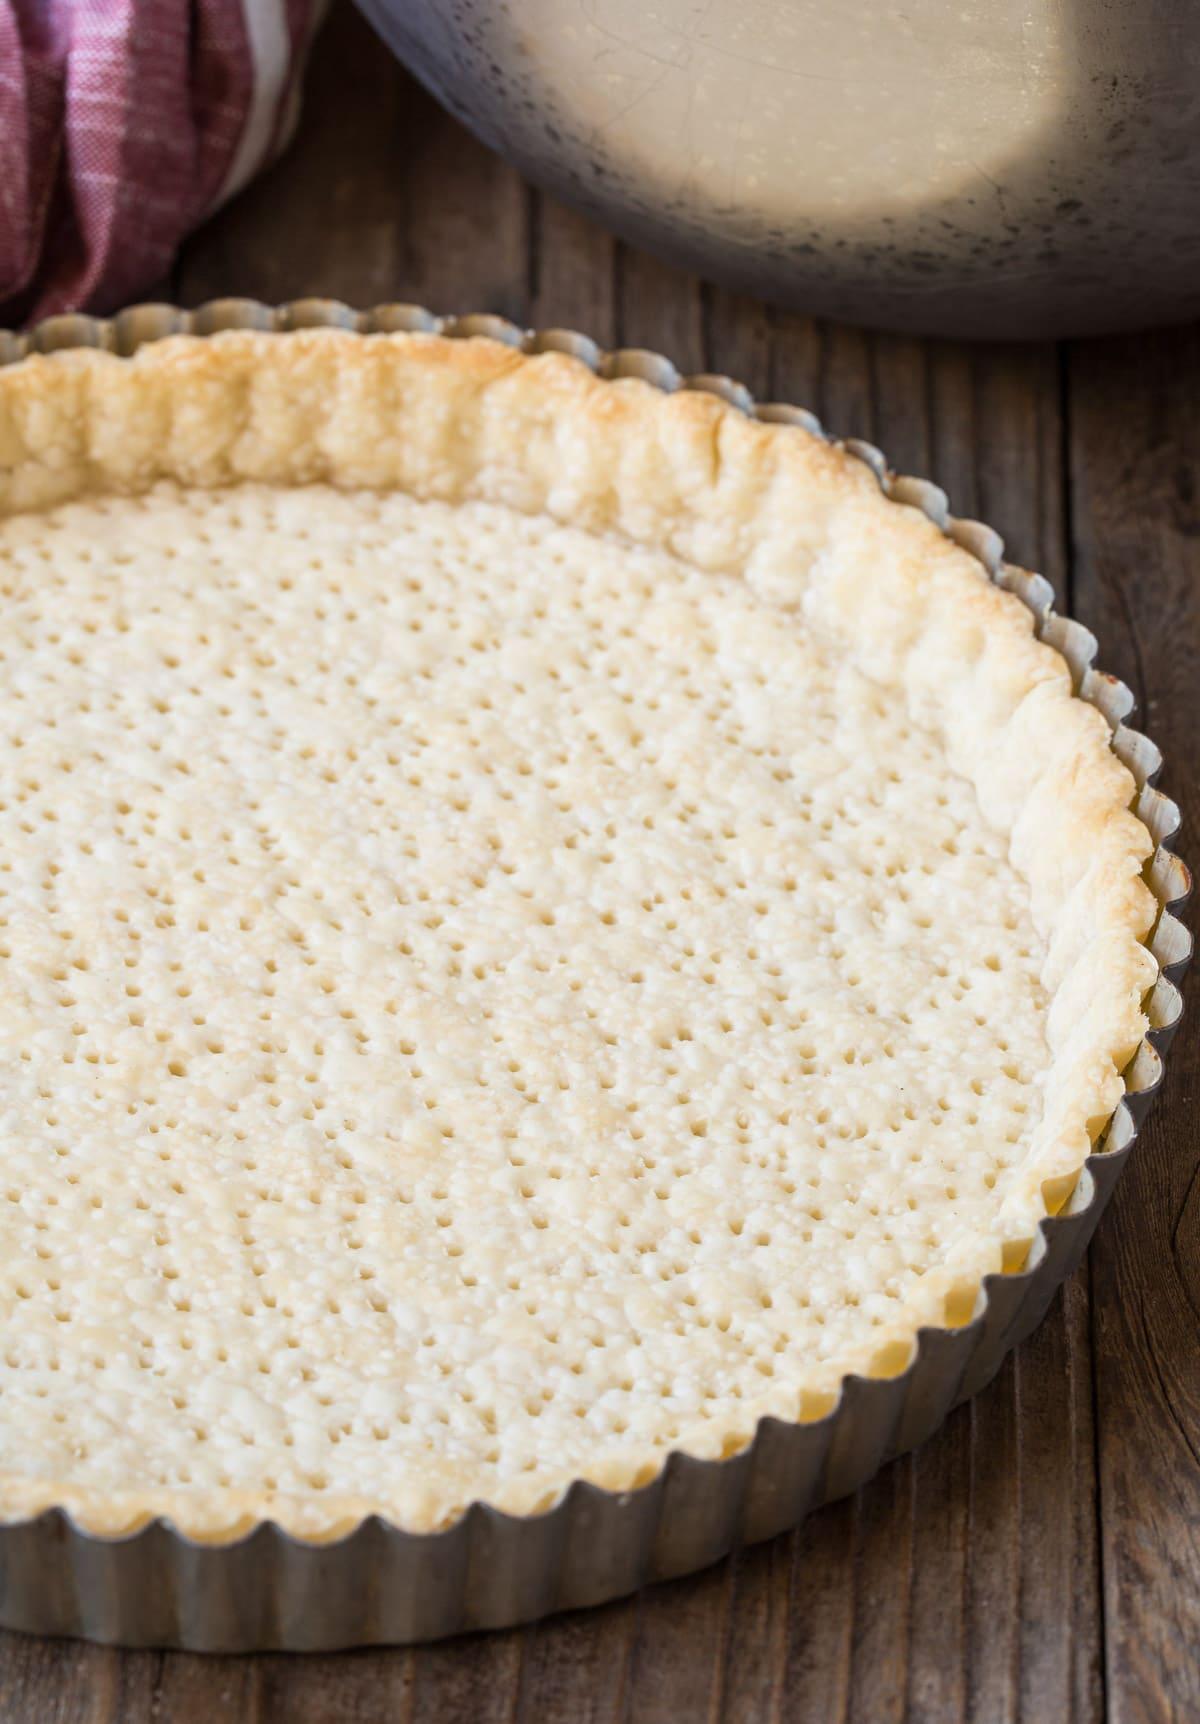 How To Make 6-Ingredient Pomegranate Cream Tart Recipe #ASpicyPerspective #holiday #pomegranaterecipe